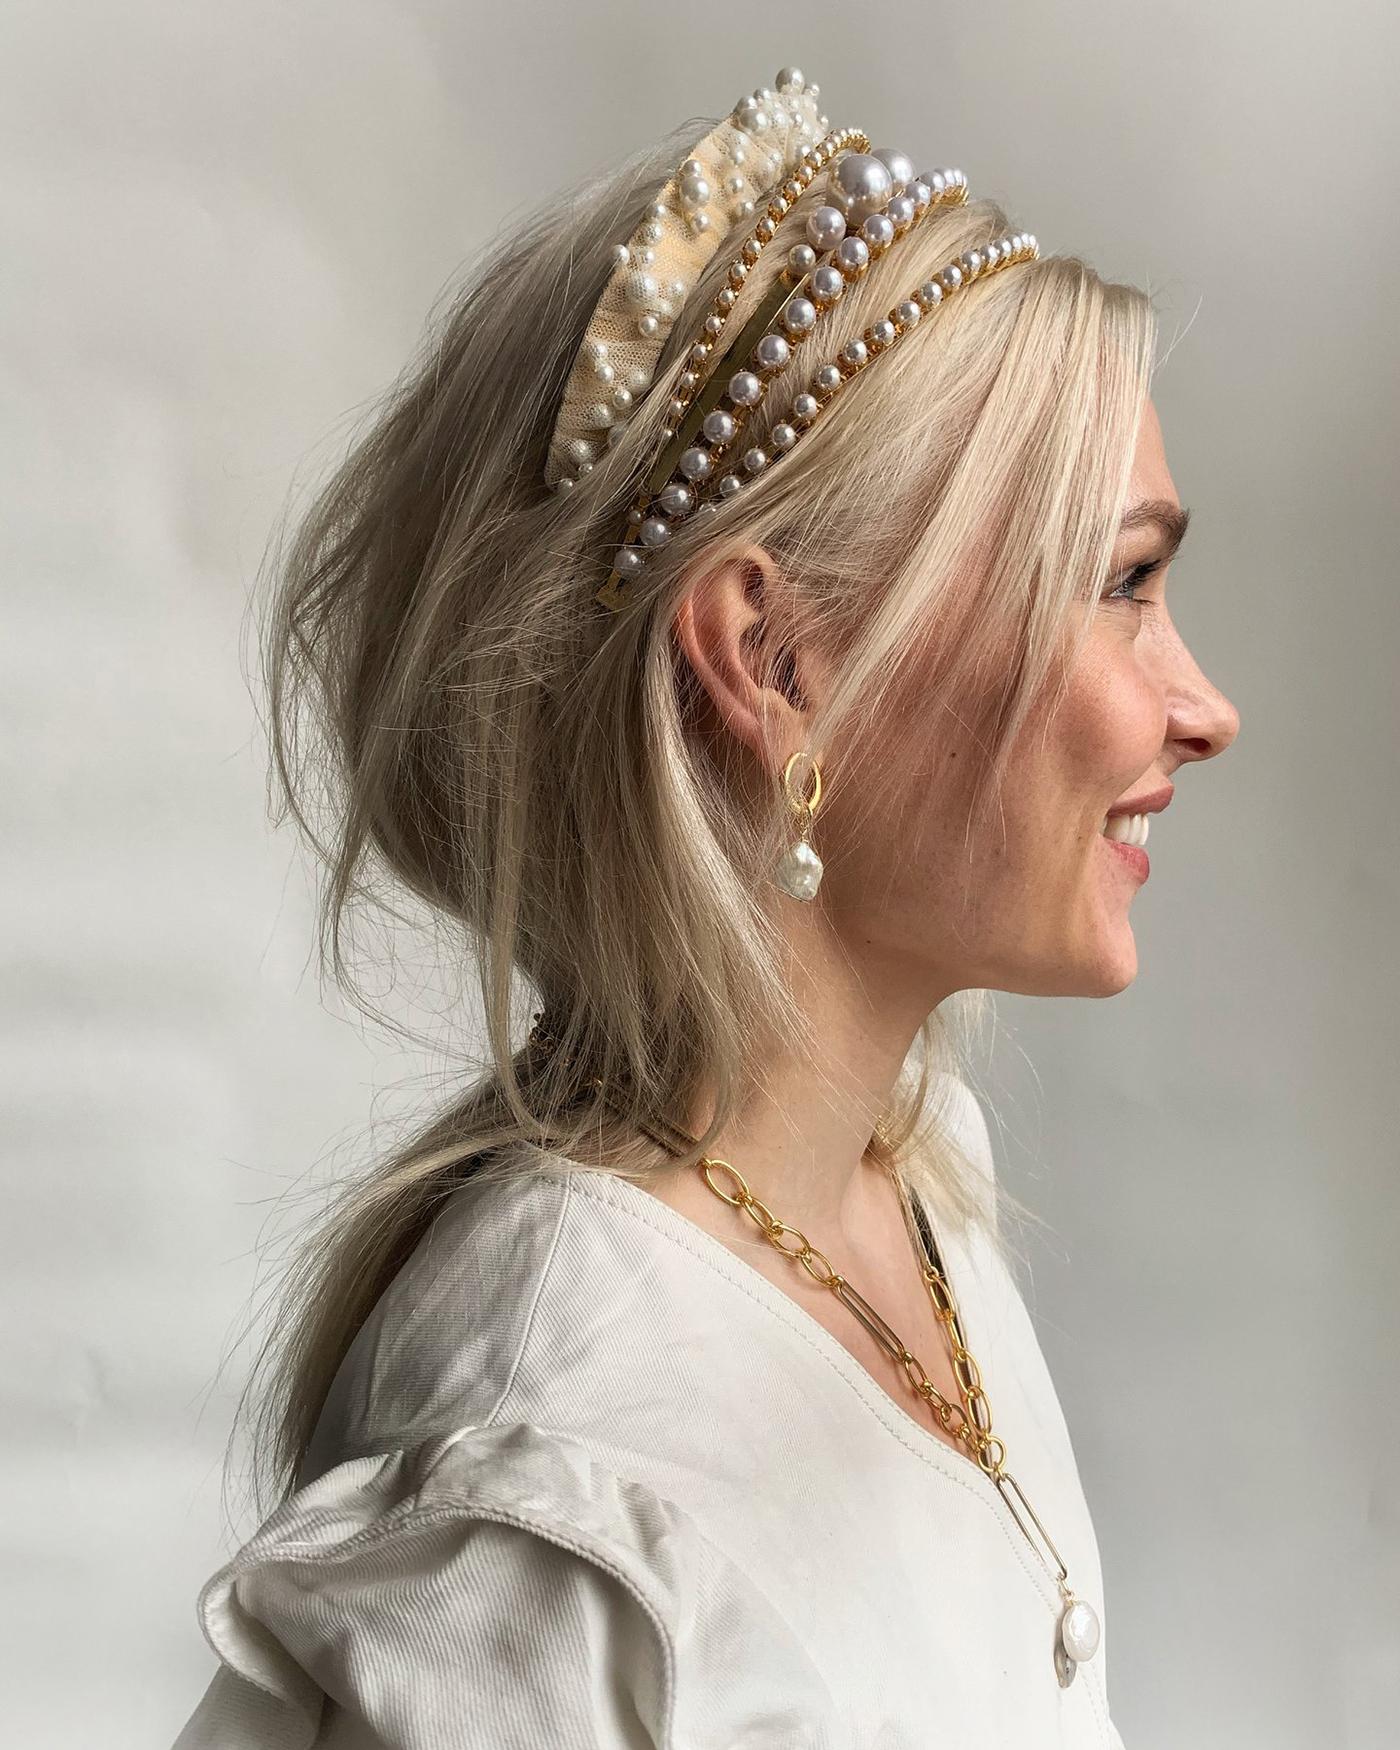 Bridgerton-Inspired Pearl Headbands